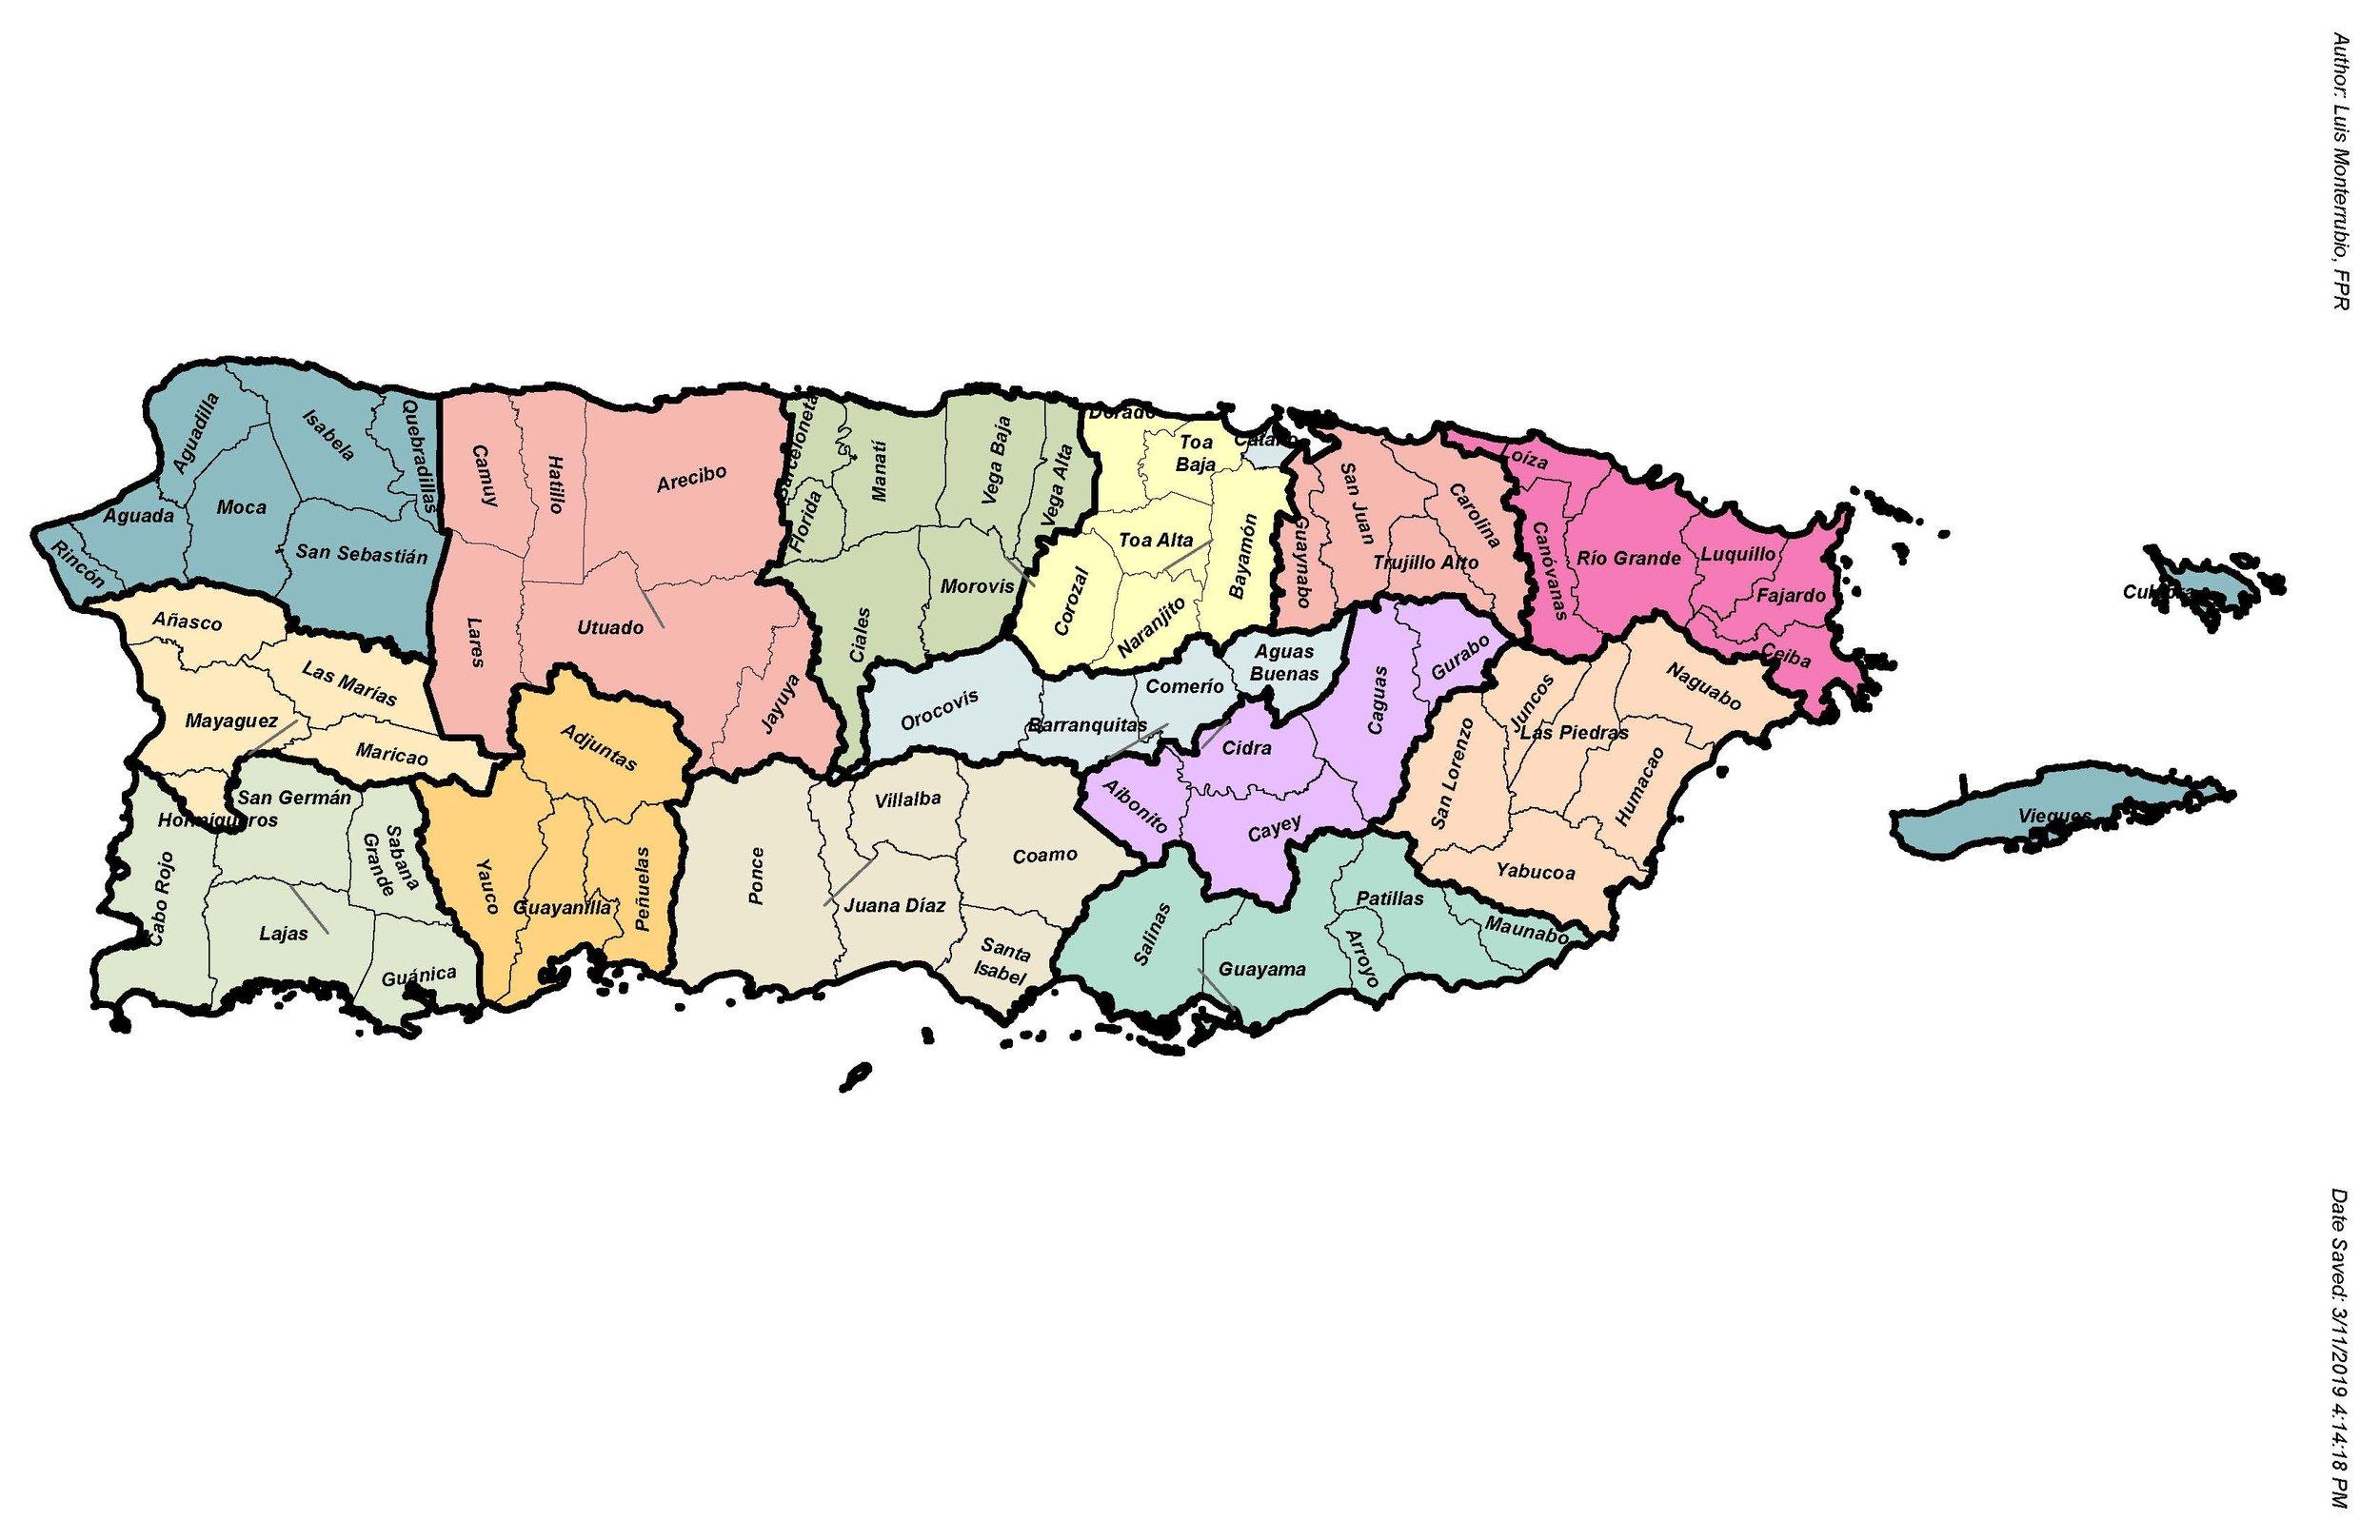 MunicipiosPorRegion.jpg